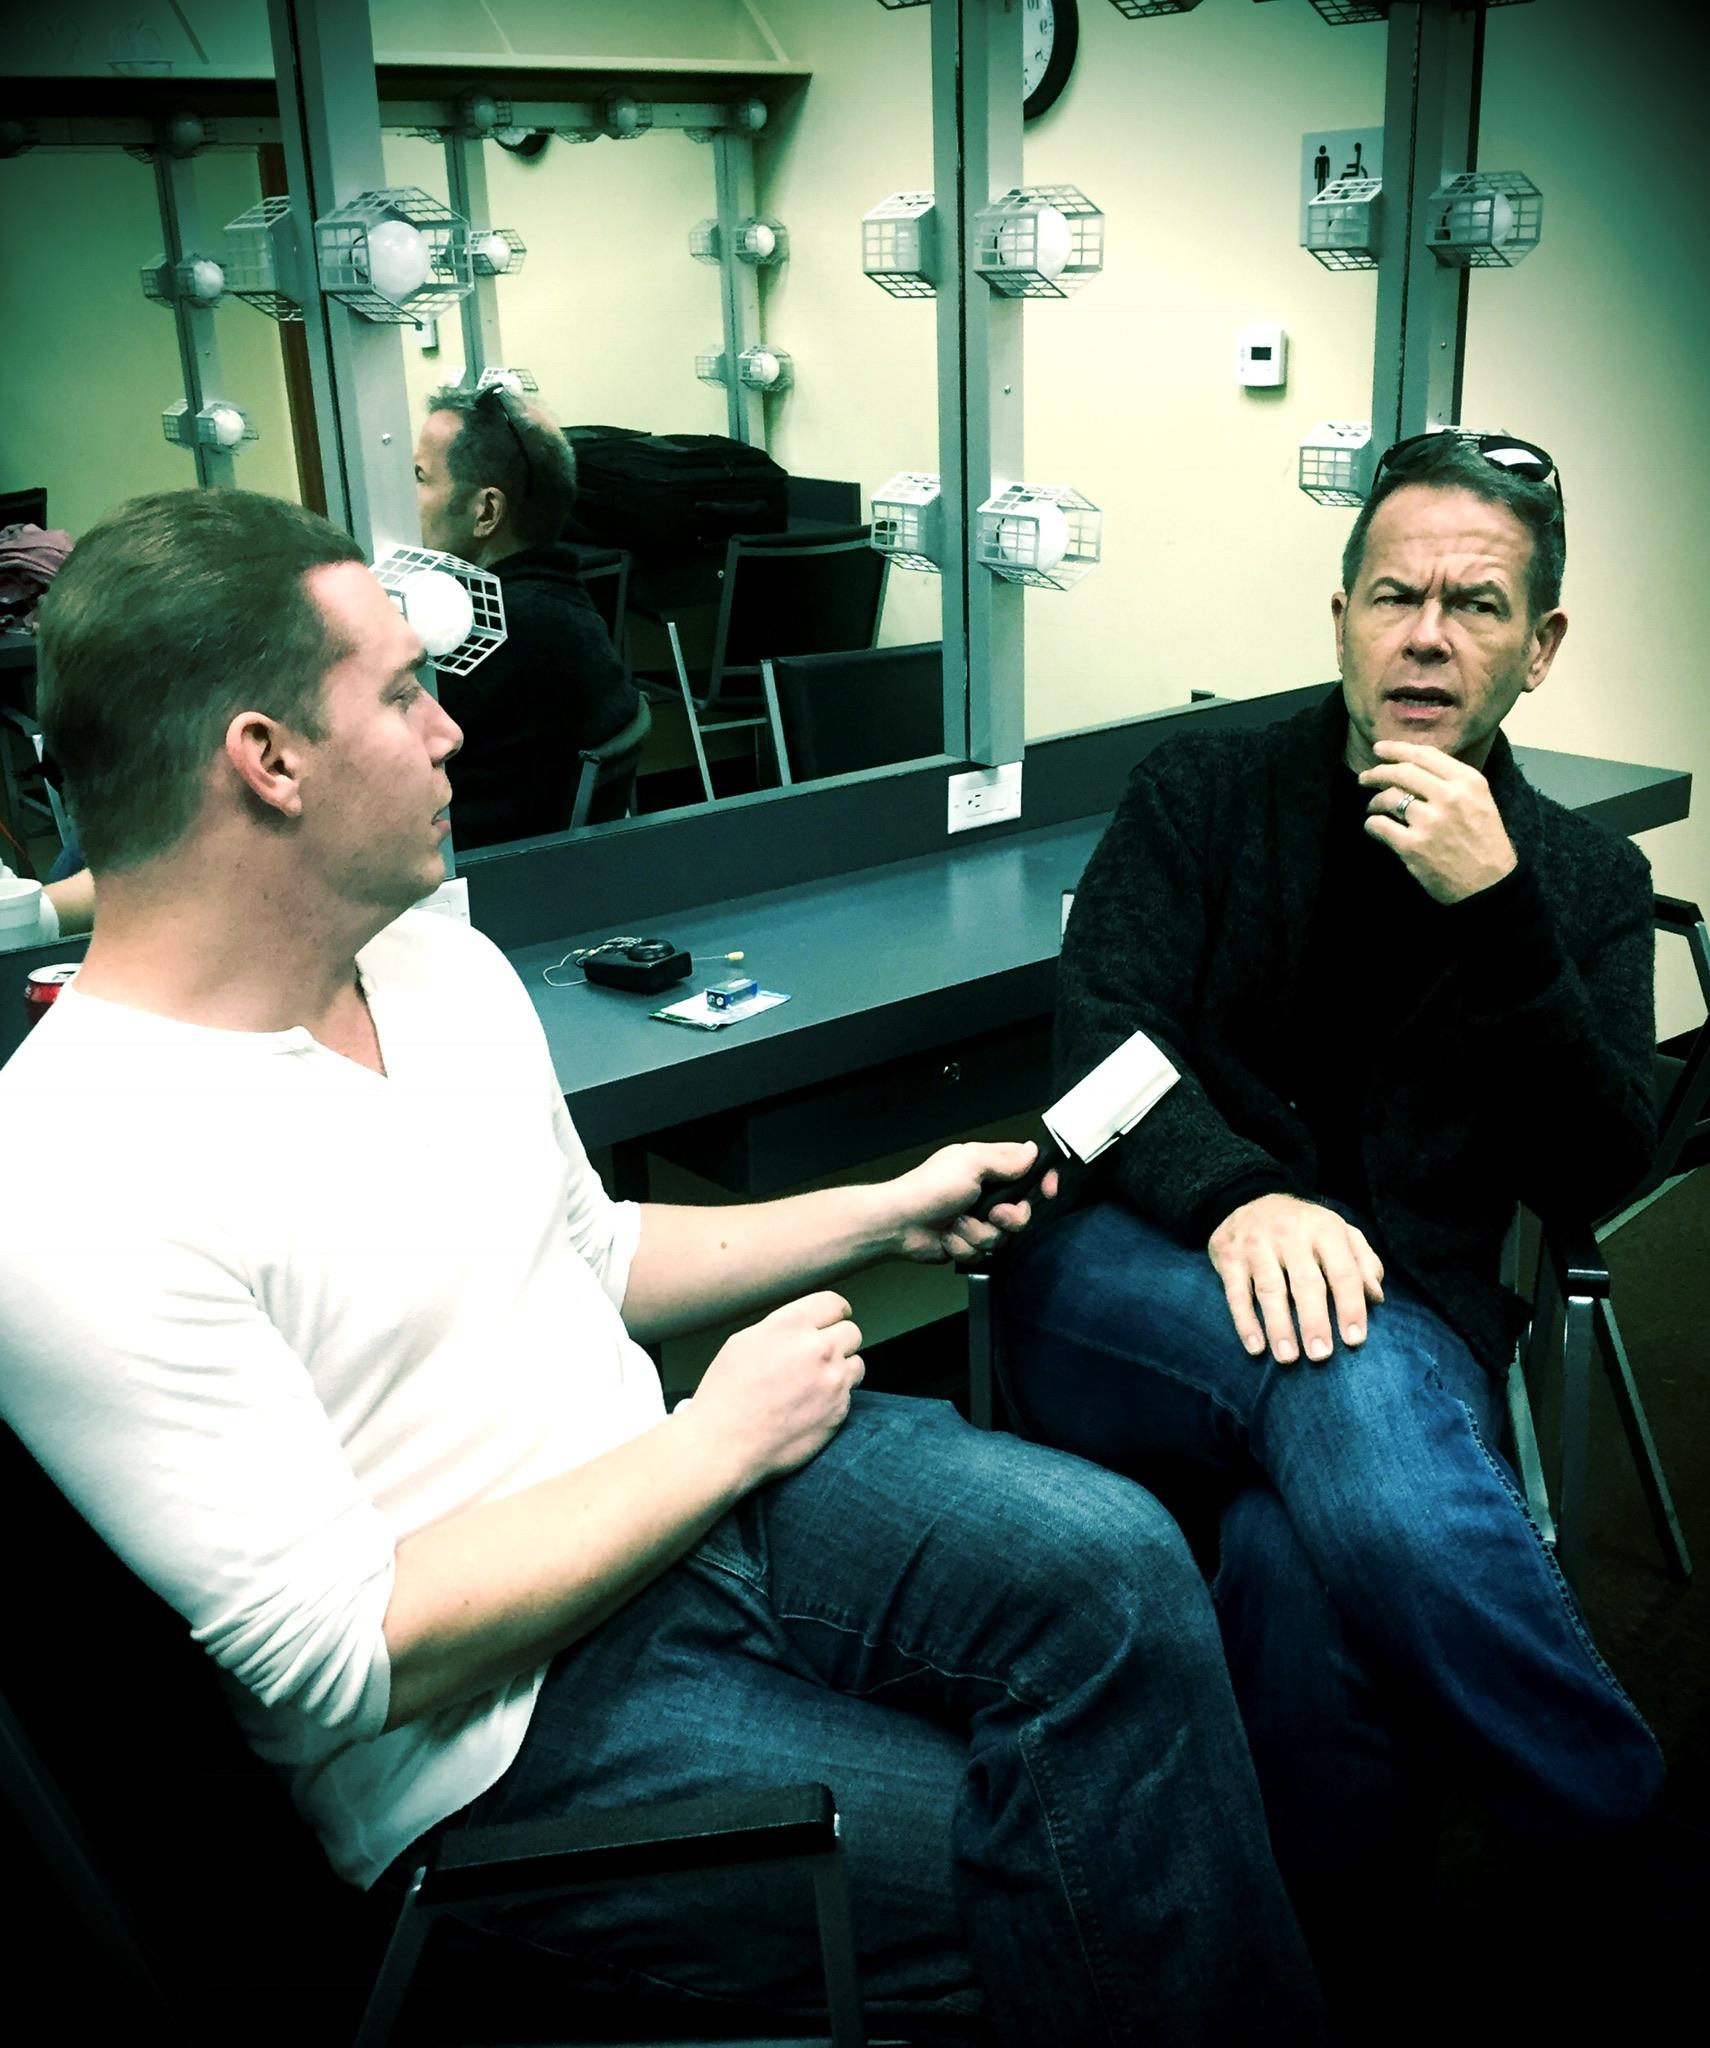 Matt Giroveanu and Greg Triggs in the Green Room, preshow